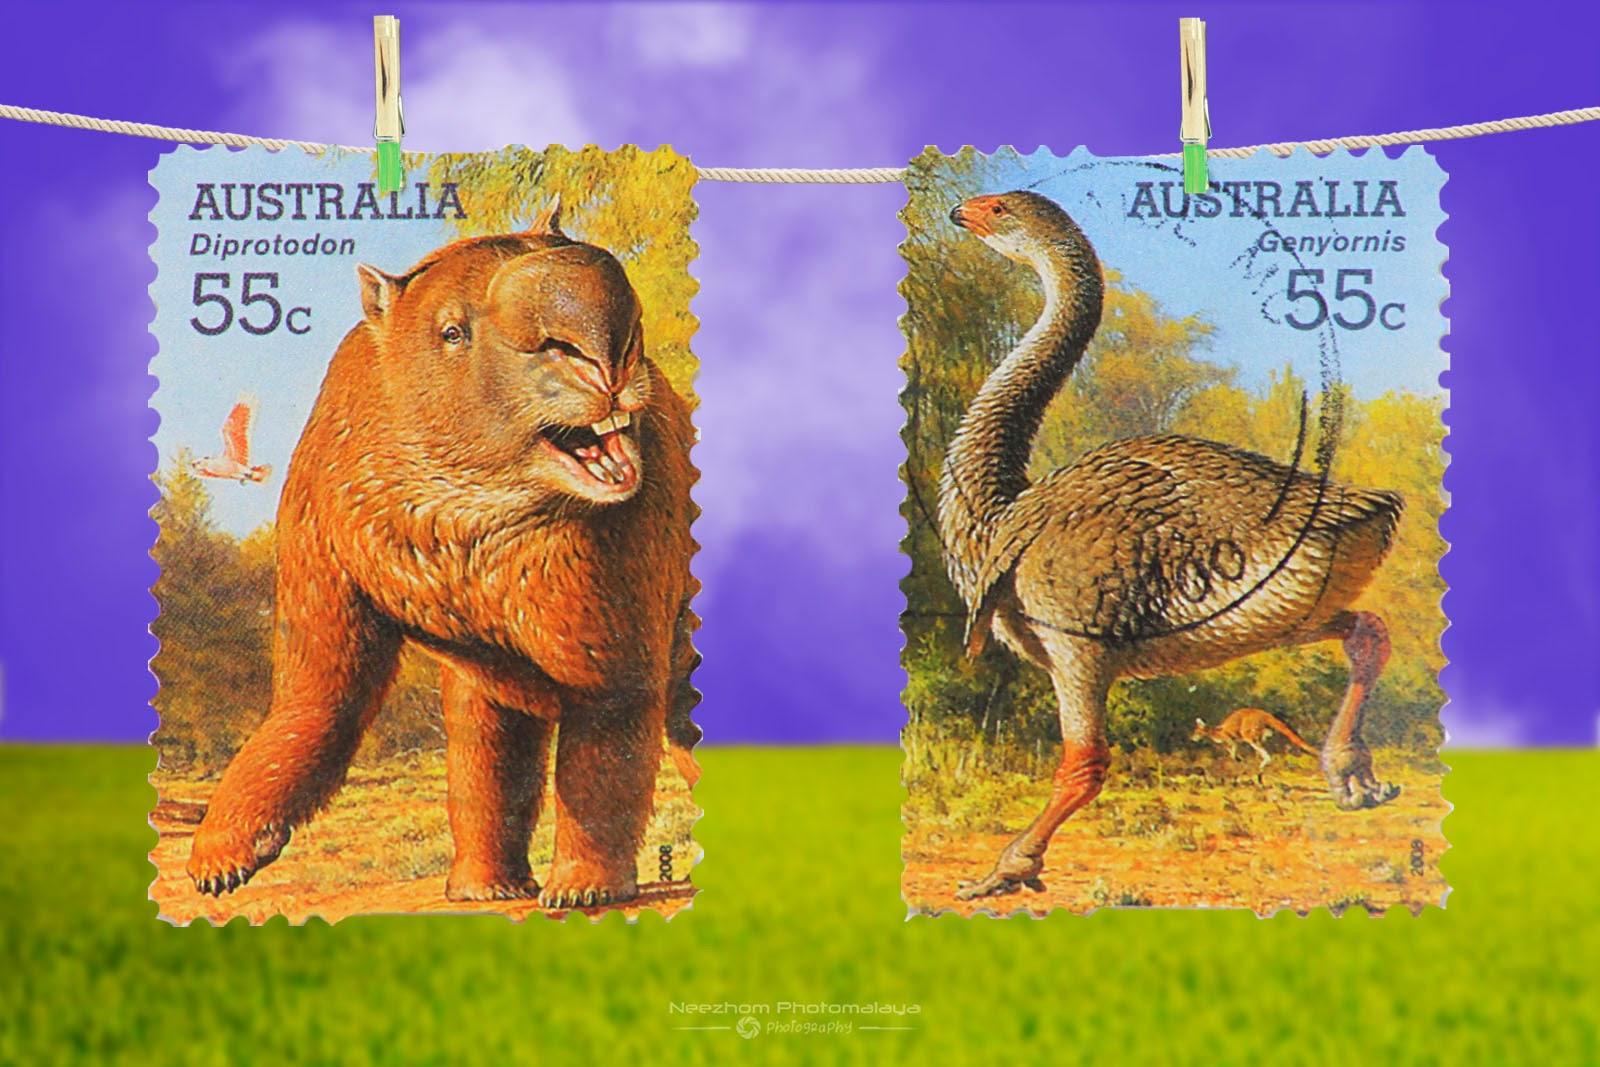 Australia 2008 Mega Fauna stamps - Diprotodon 55c, Genyornis 55c